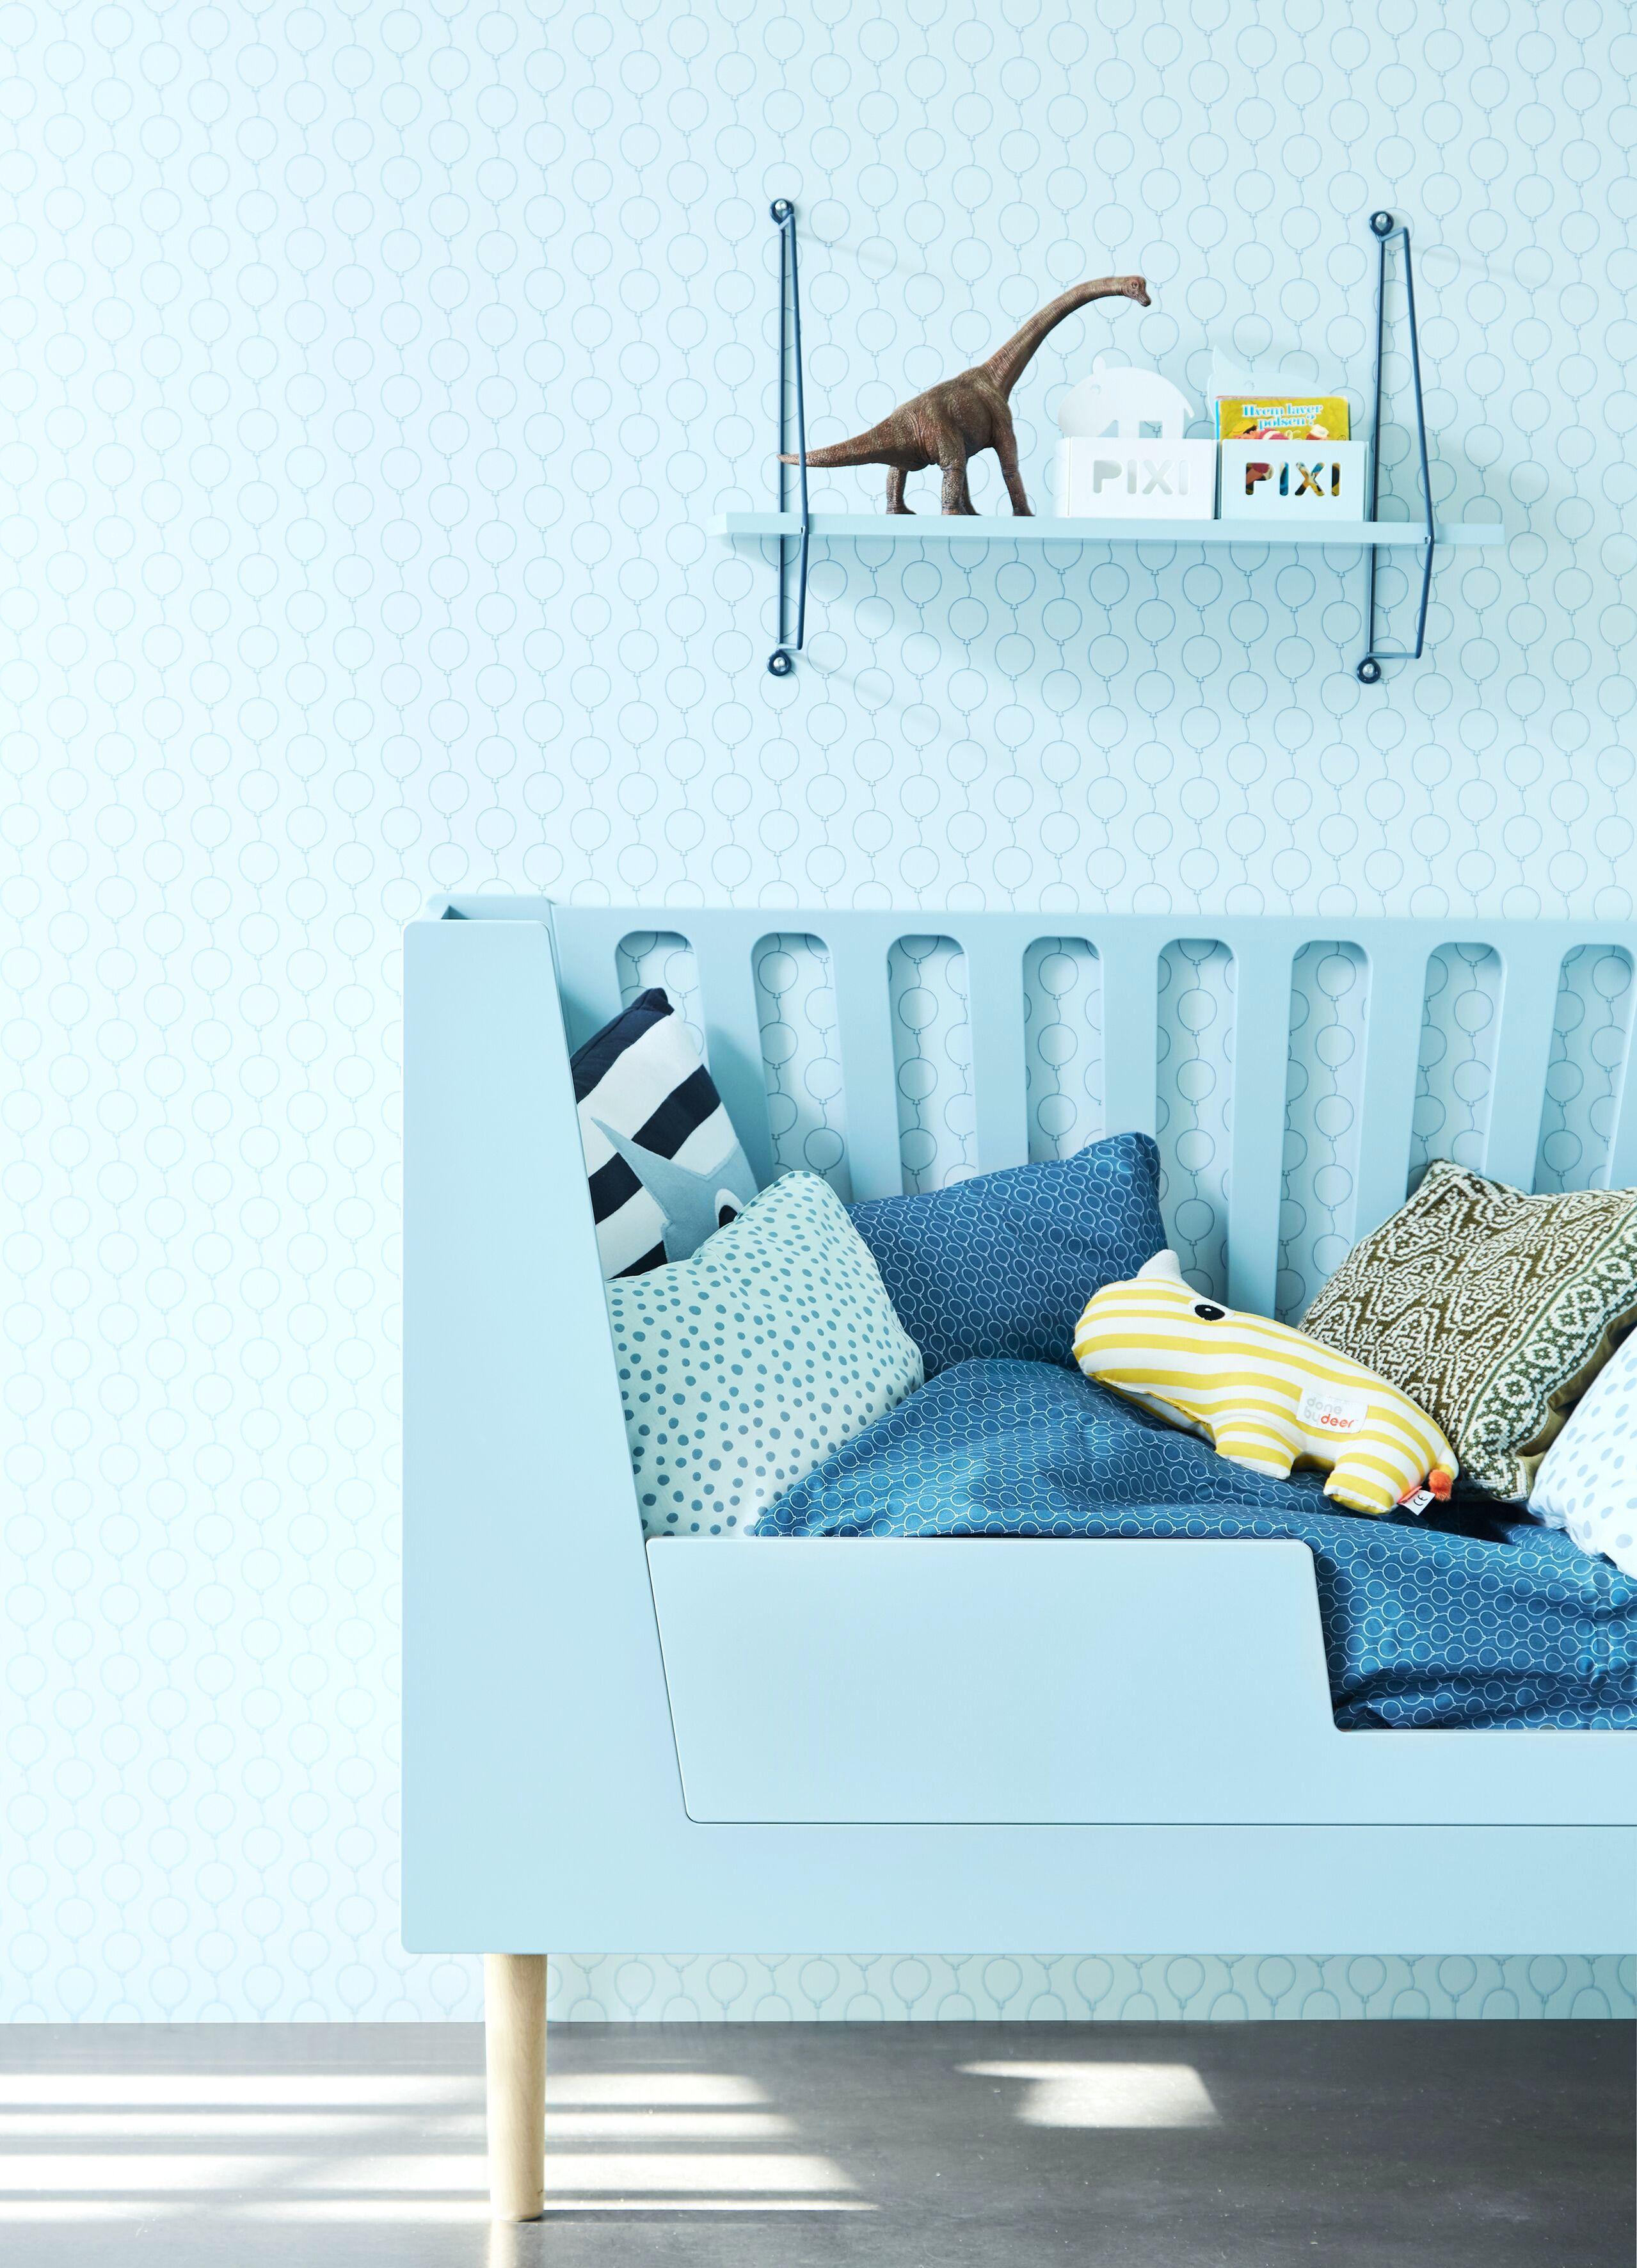 Lit évolutif By Done By Deer Dans Ma Chambre Pinterest Lights